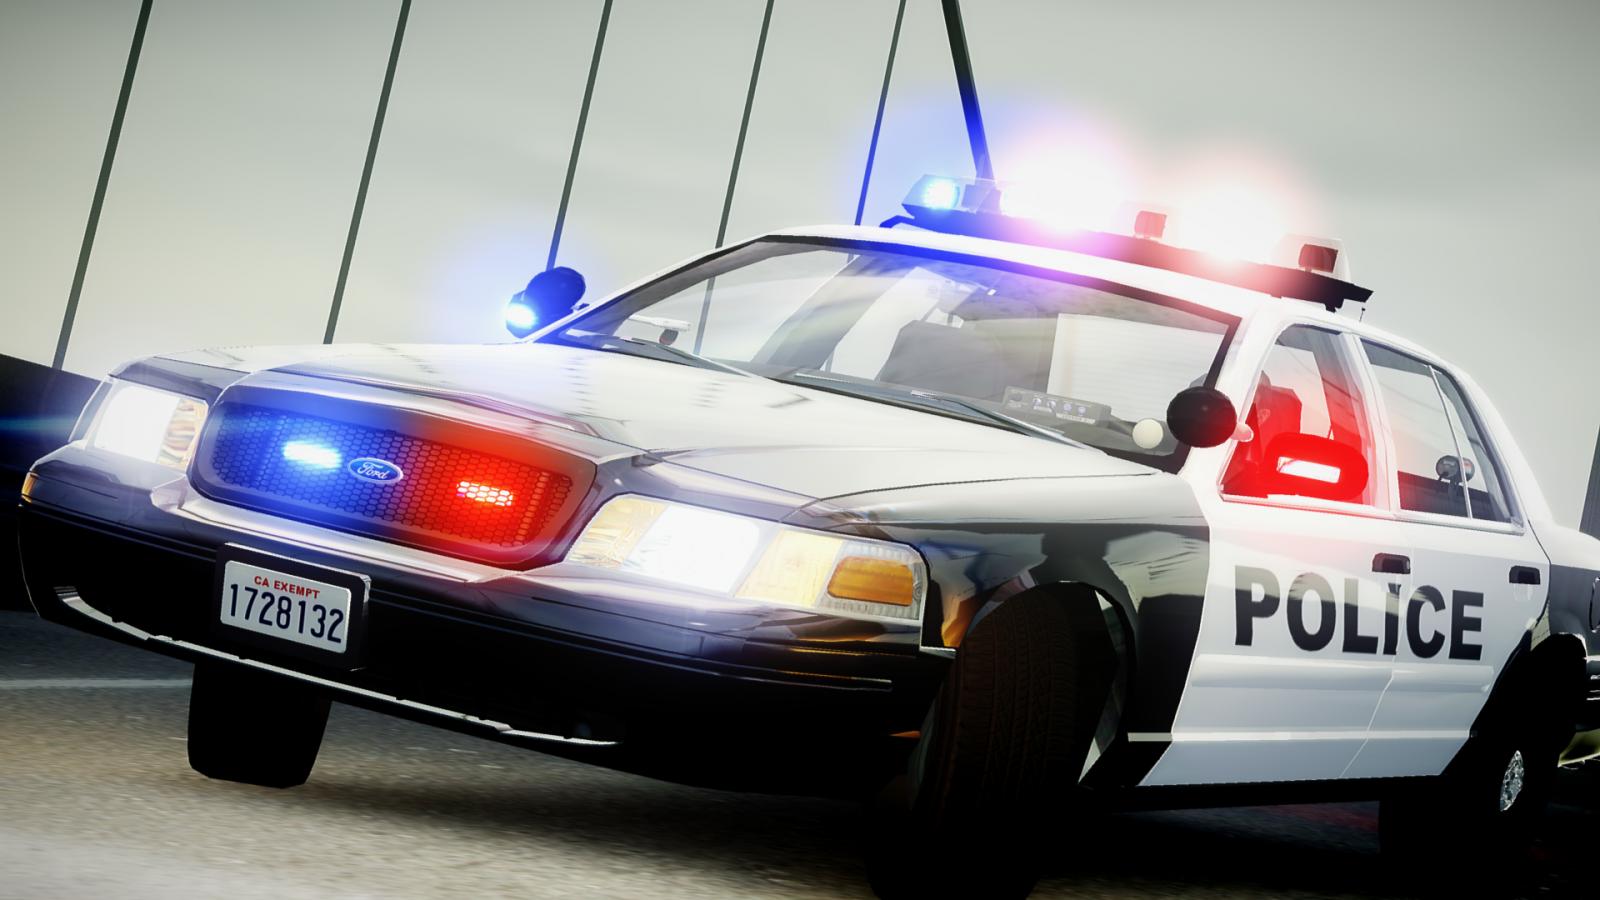 Halifax regional police gmc savana for gta 4.